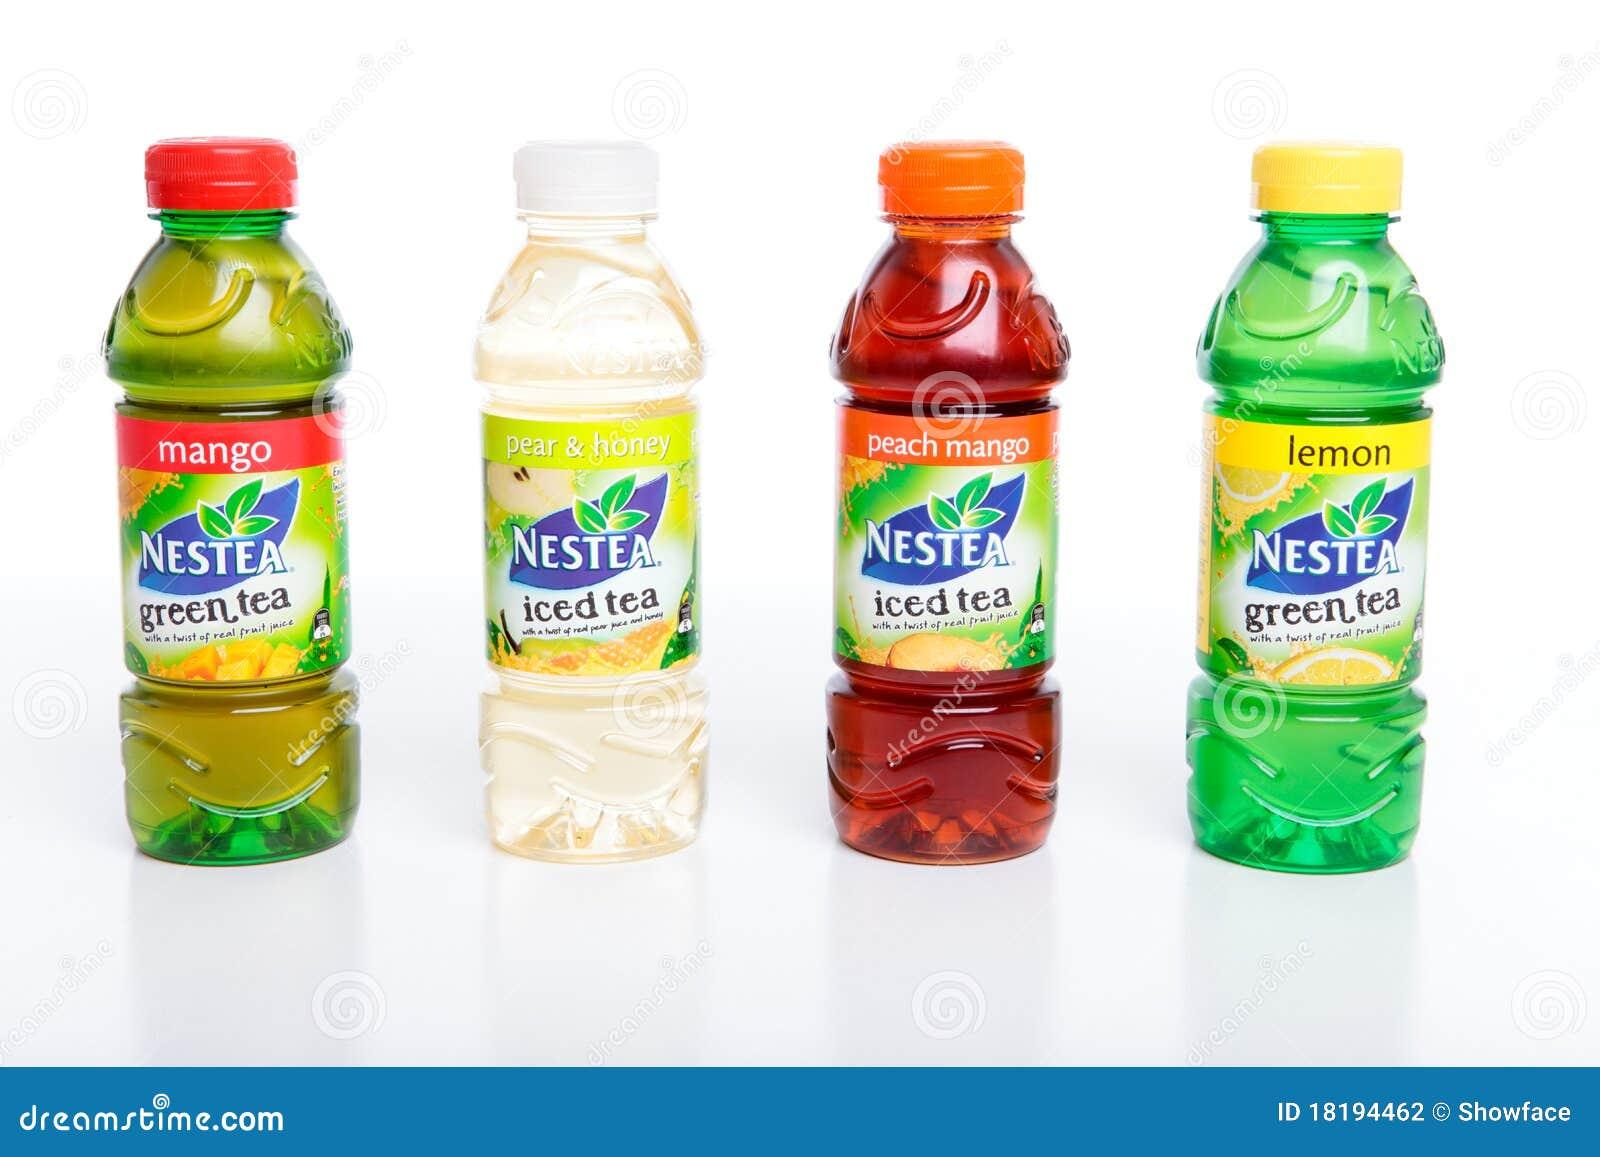 Nestle getränke